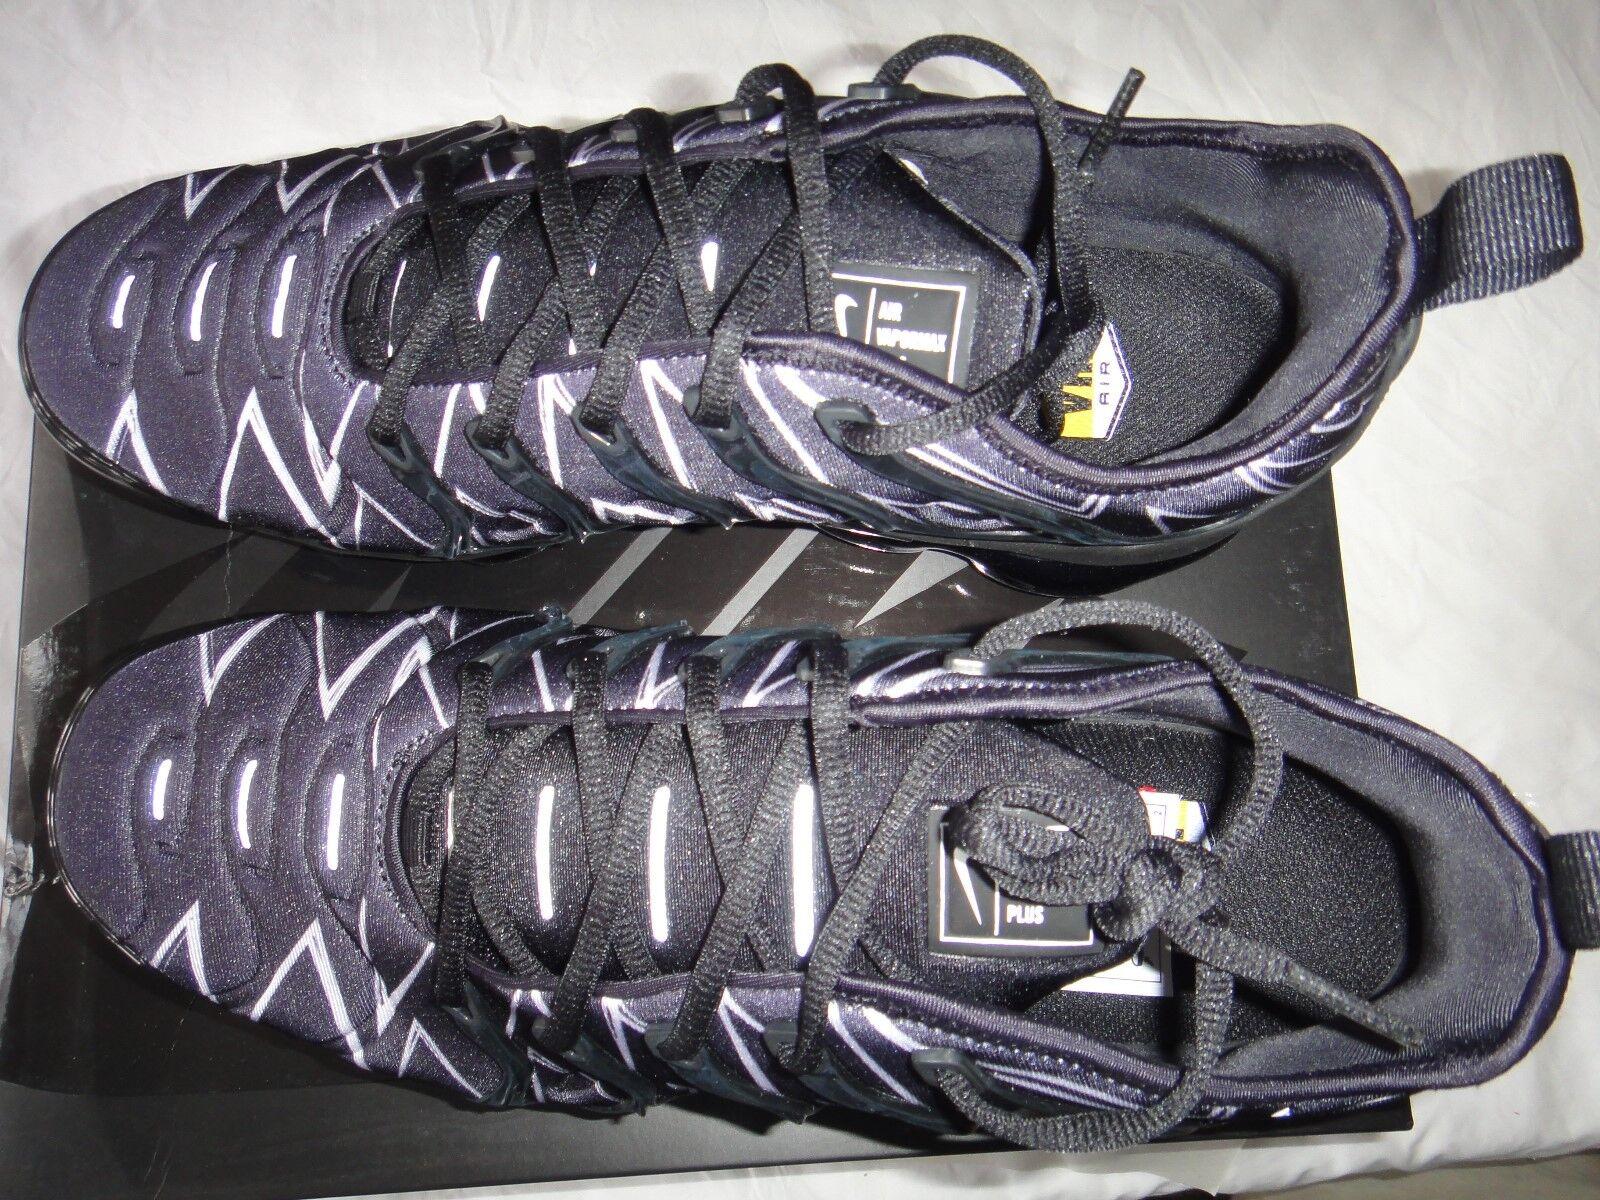 Nike Air VaporMax VaporMax VaporMax Plus HL Zig-Zag AJ6312-001 Bianca Nera Taglia RARO!!! 5b9c34